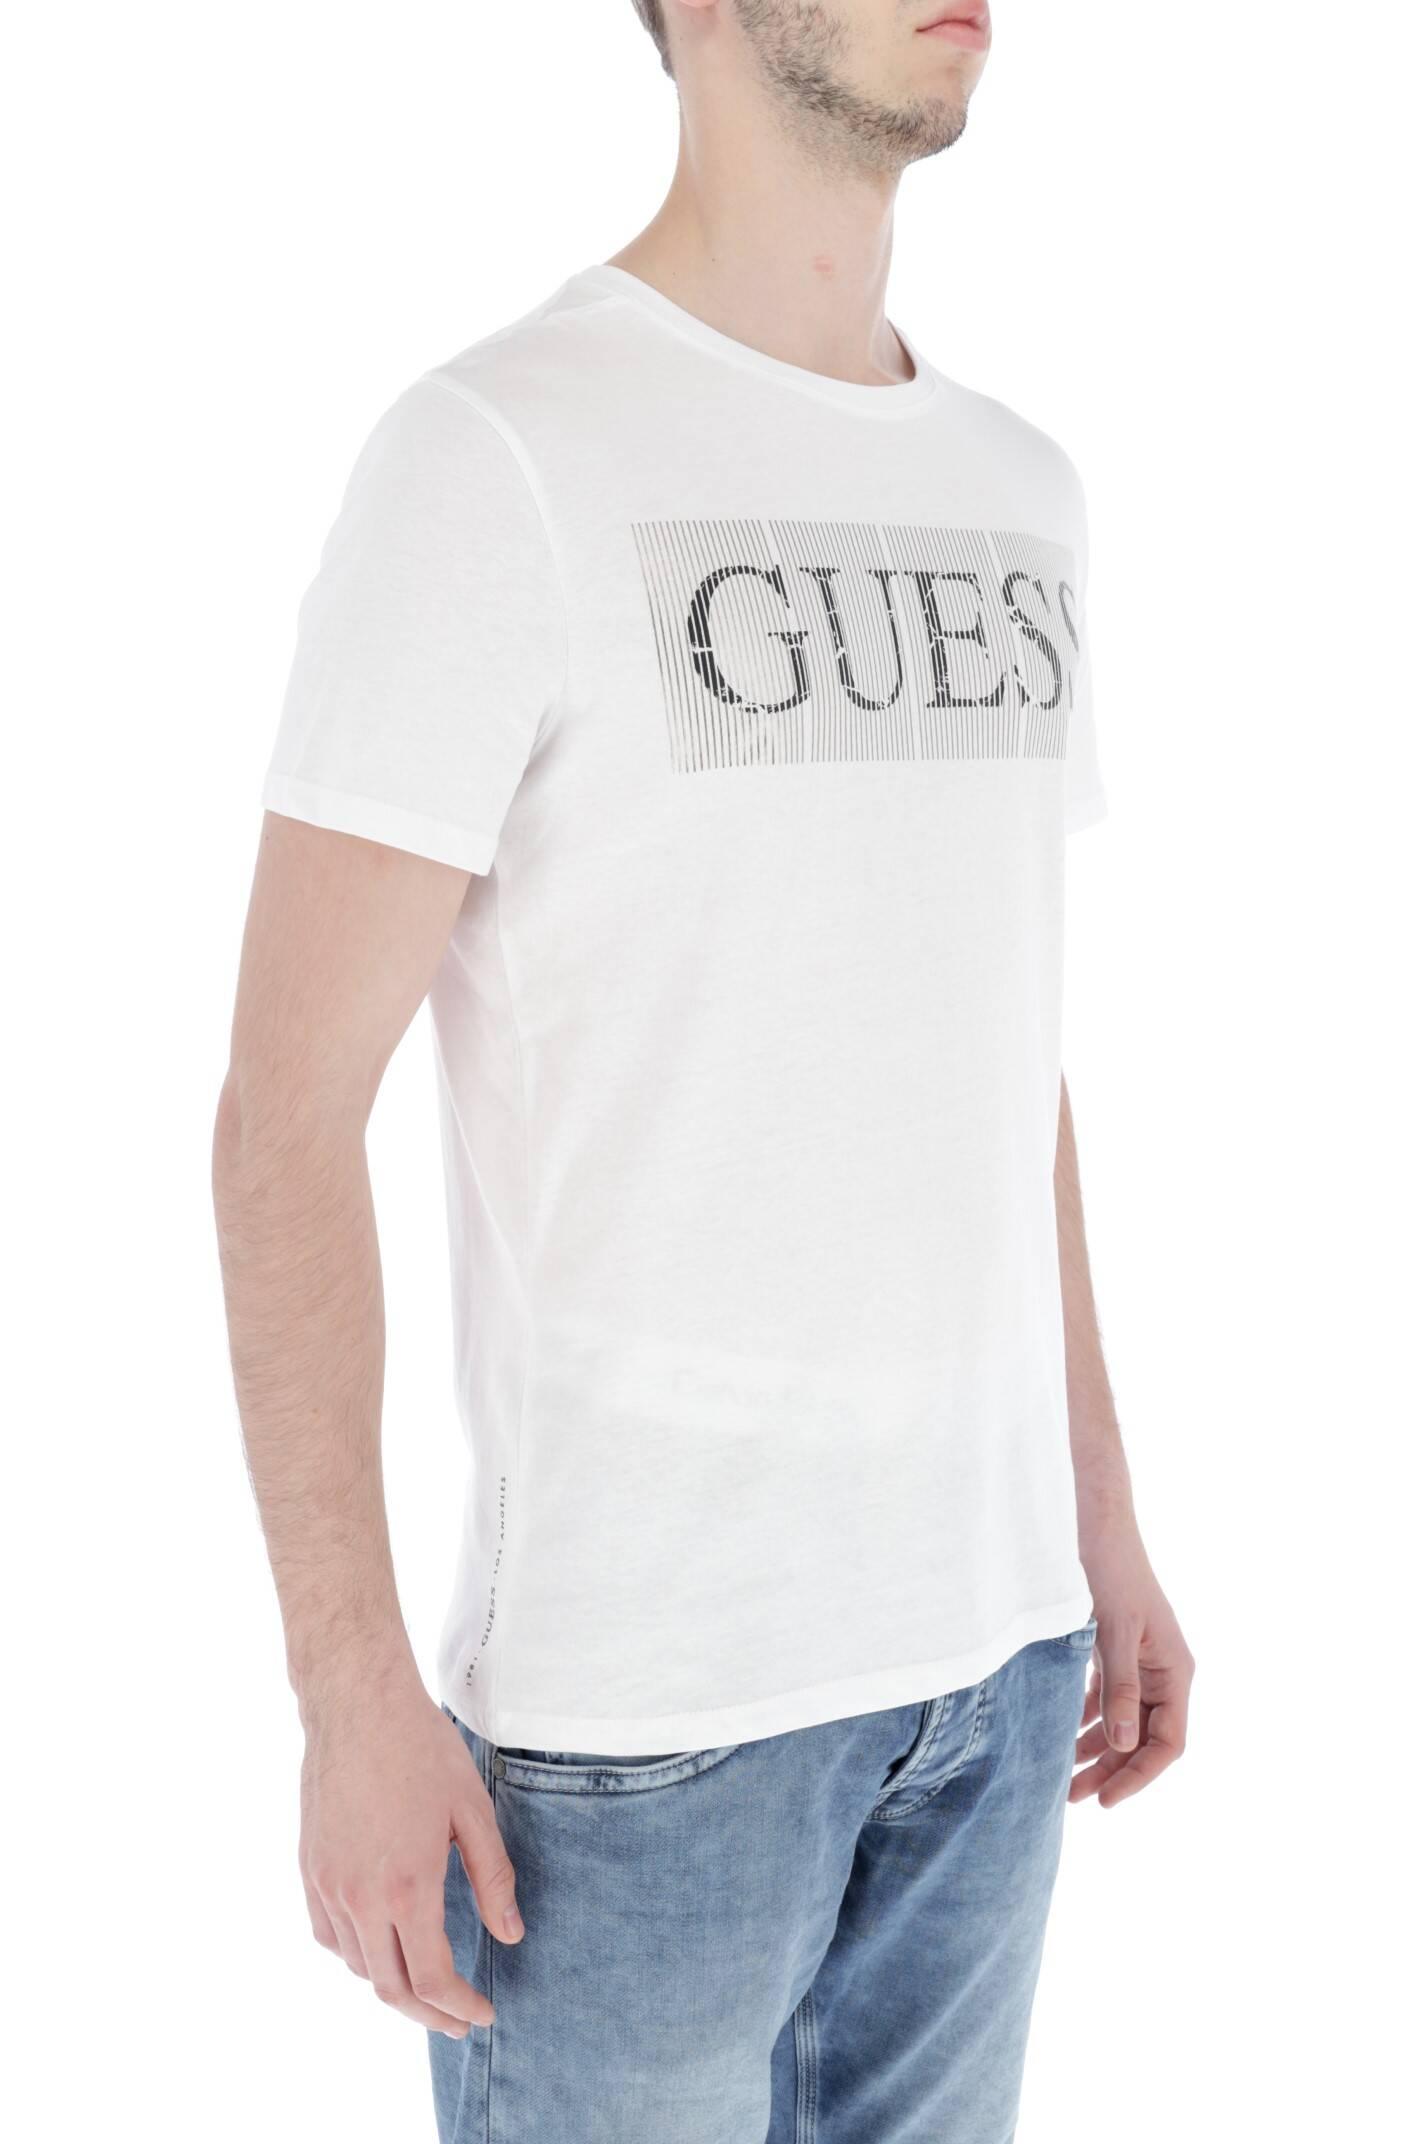 T shirt FOIL BAND | Slim Fit Guess Jeans | Czarny M83I04 I3Z00